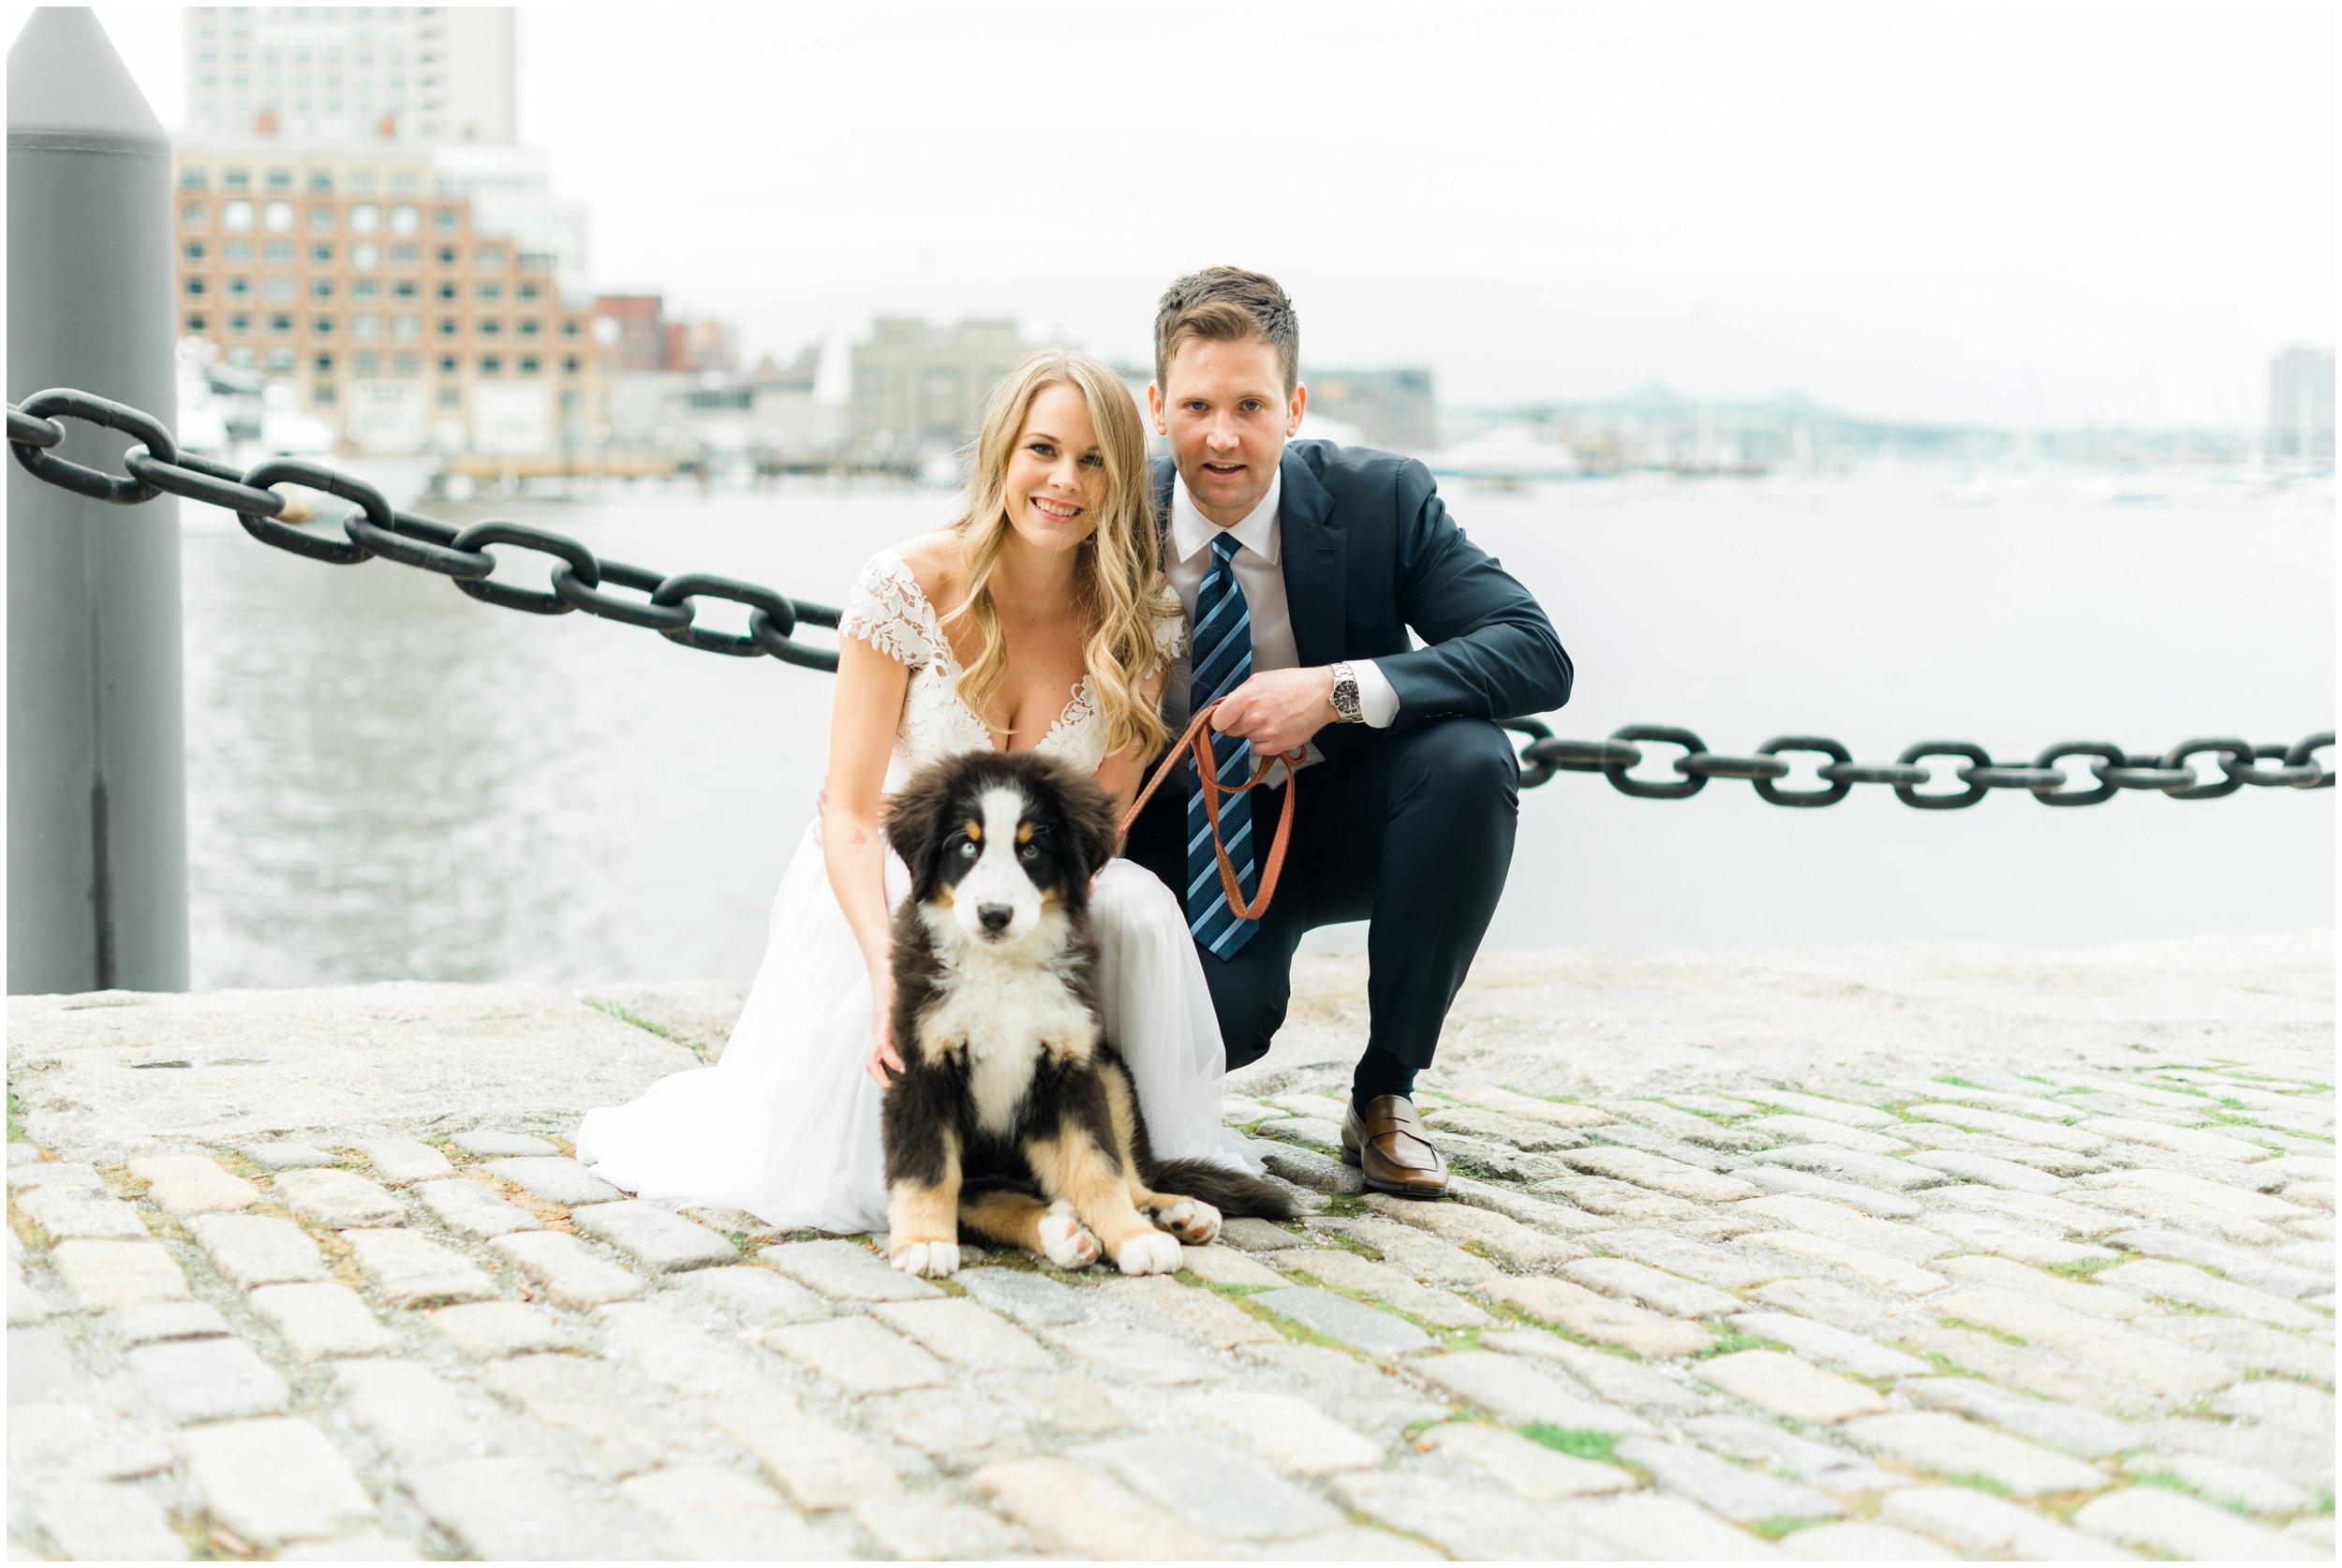 jay-robin-married-row-34-boston-15.jpg